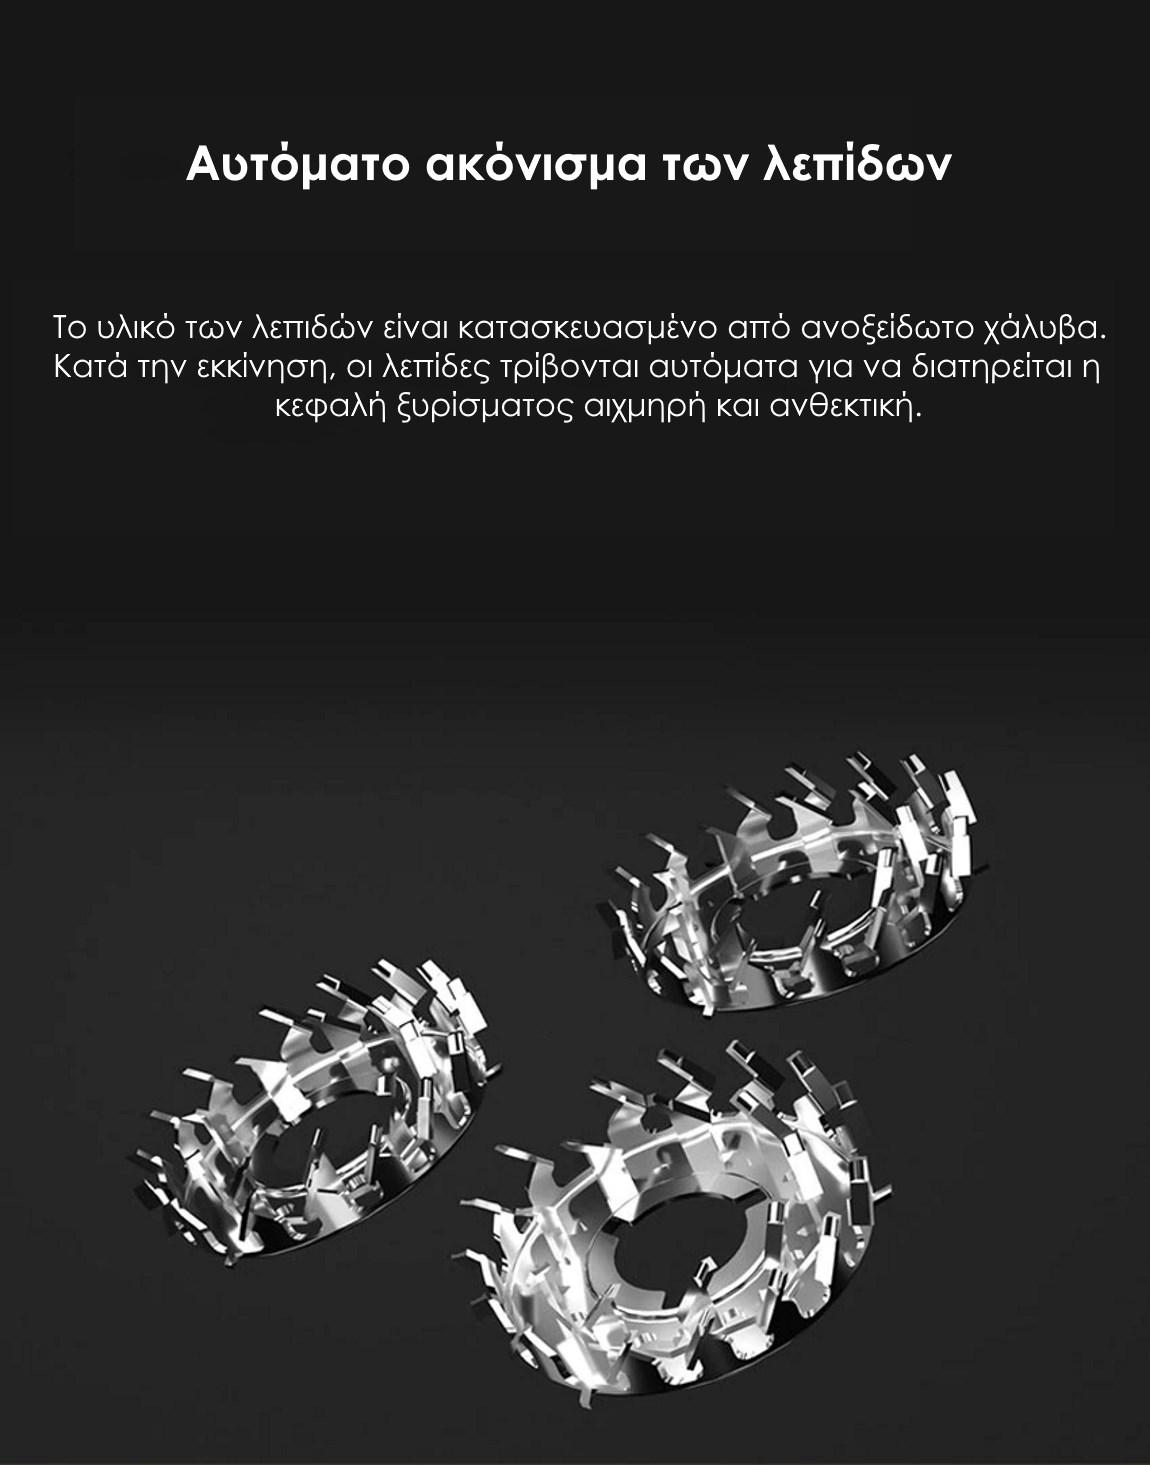 Enchen Blackstone 3CJ 3D ακόνισμα